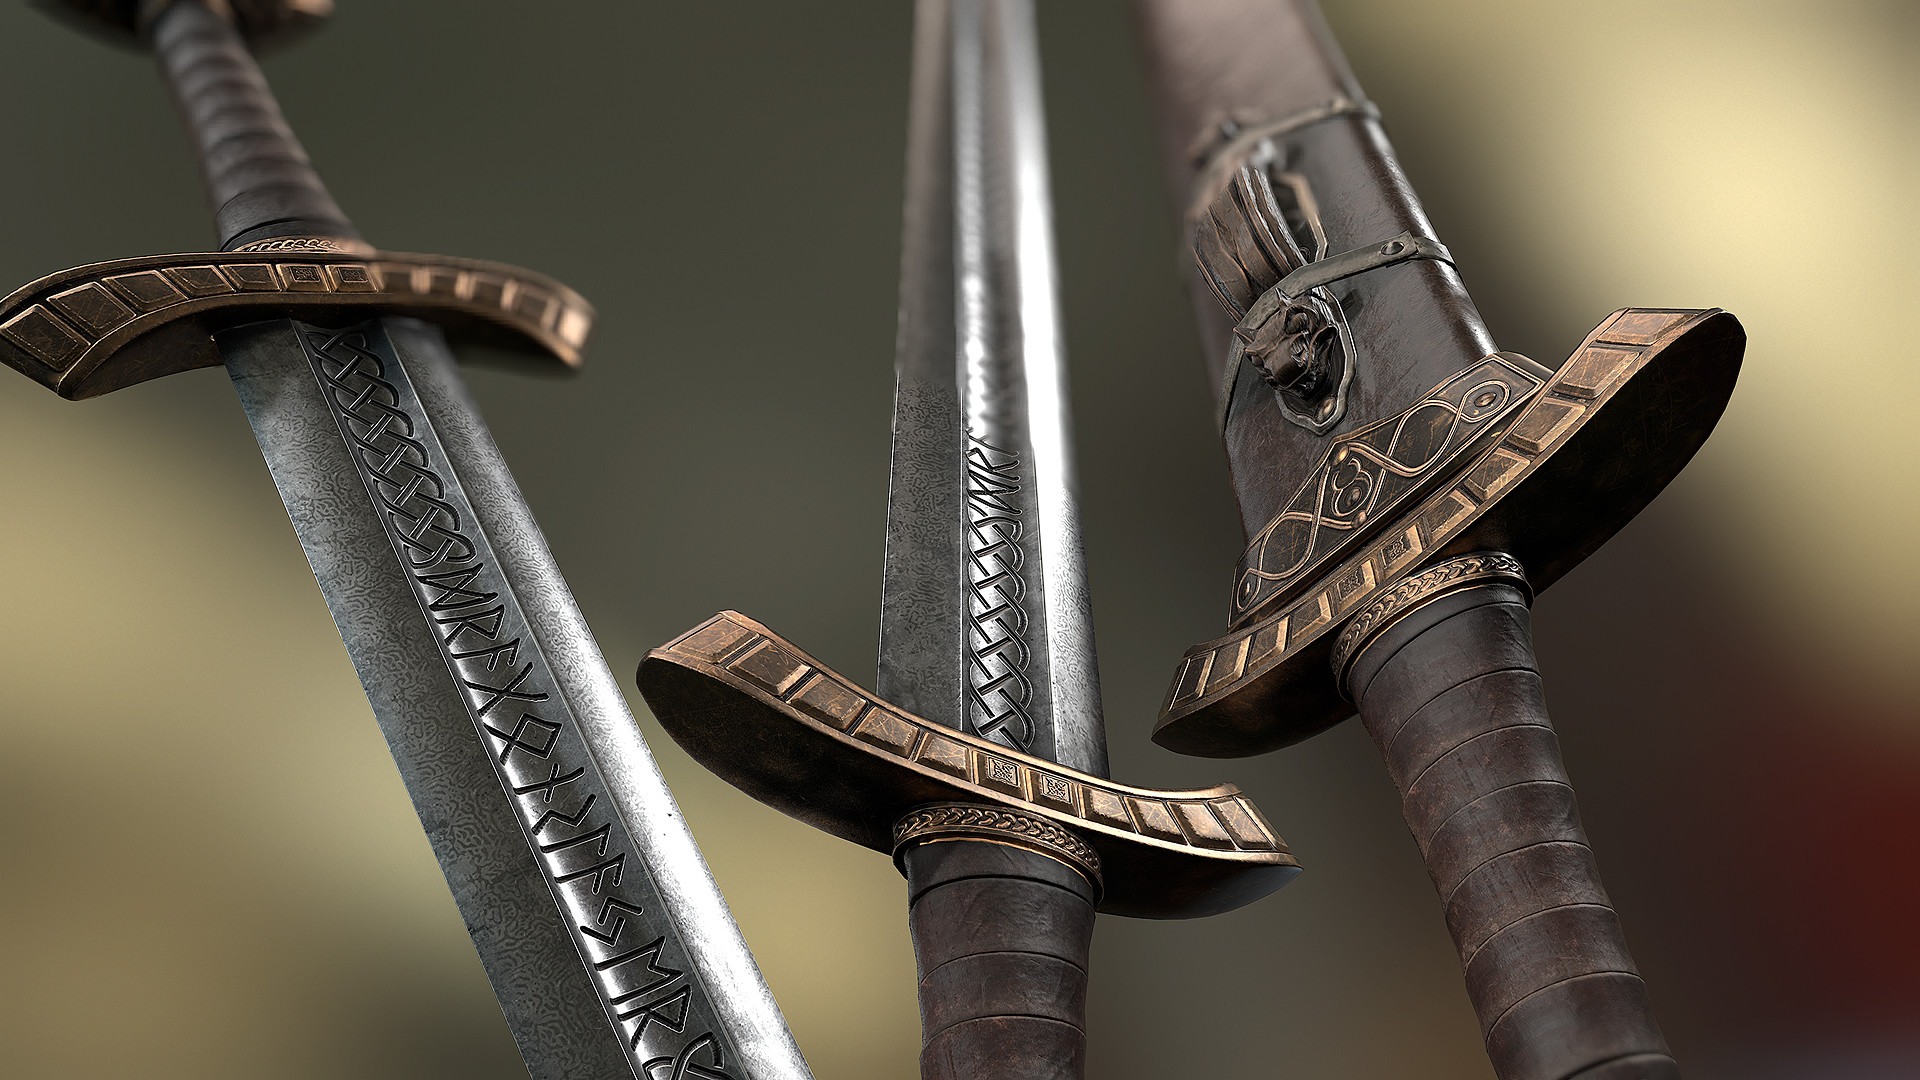 Wiktor ohman sword2